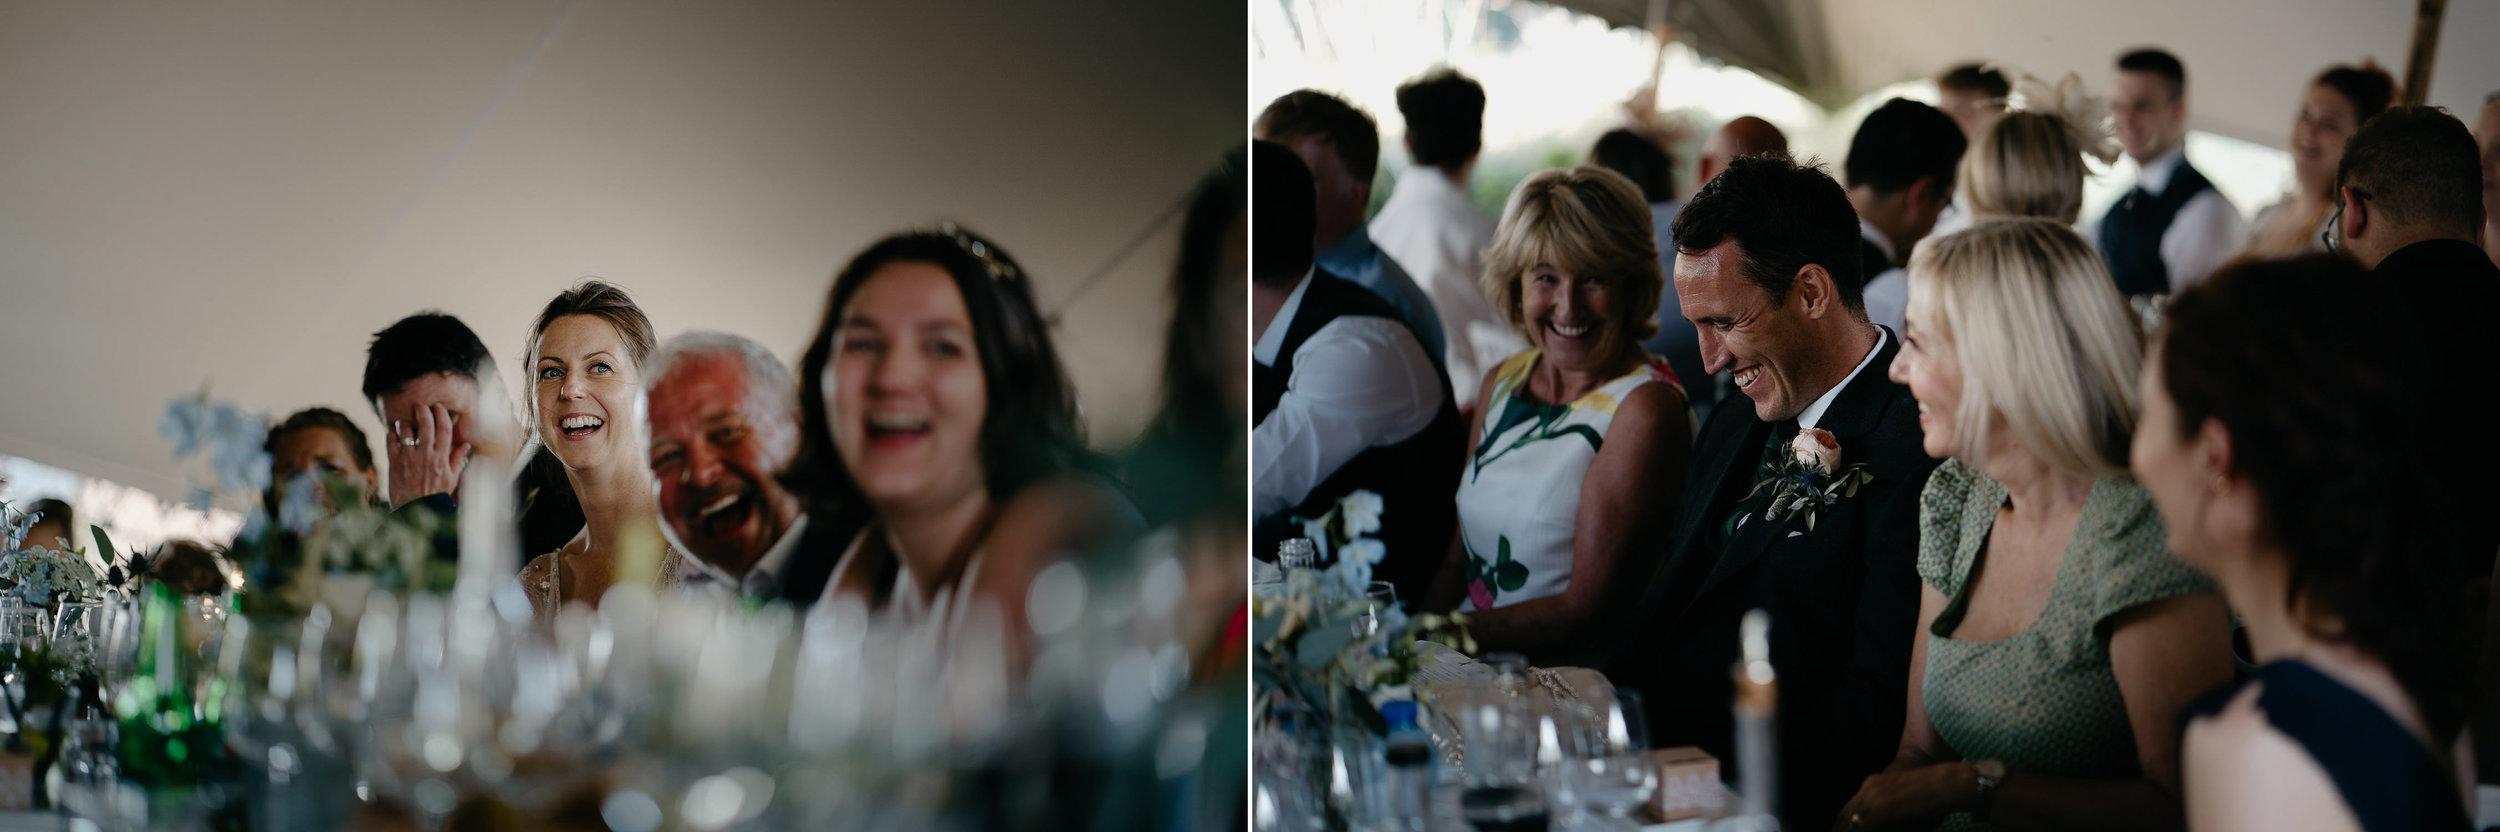 Bruiloftraportage fotografie mark hadden bruiloftfotograaf amsterdam